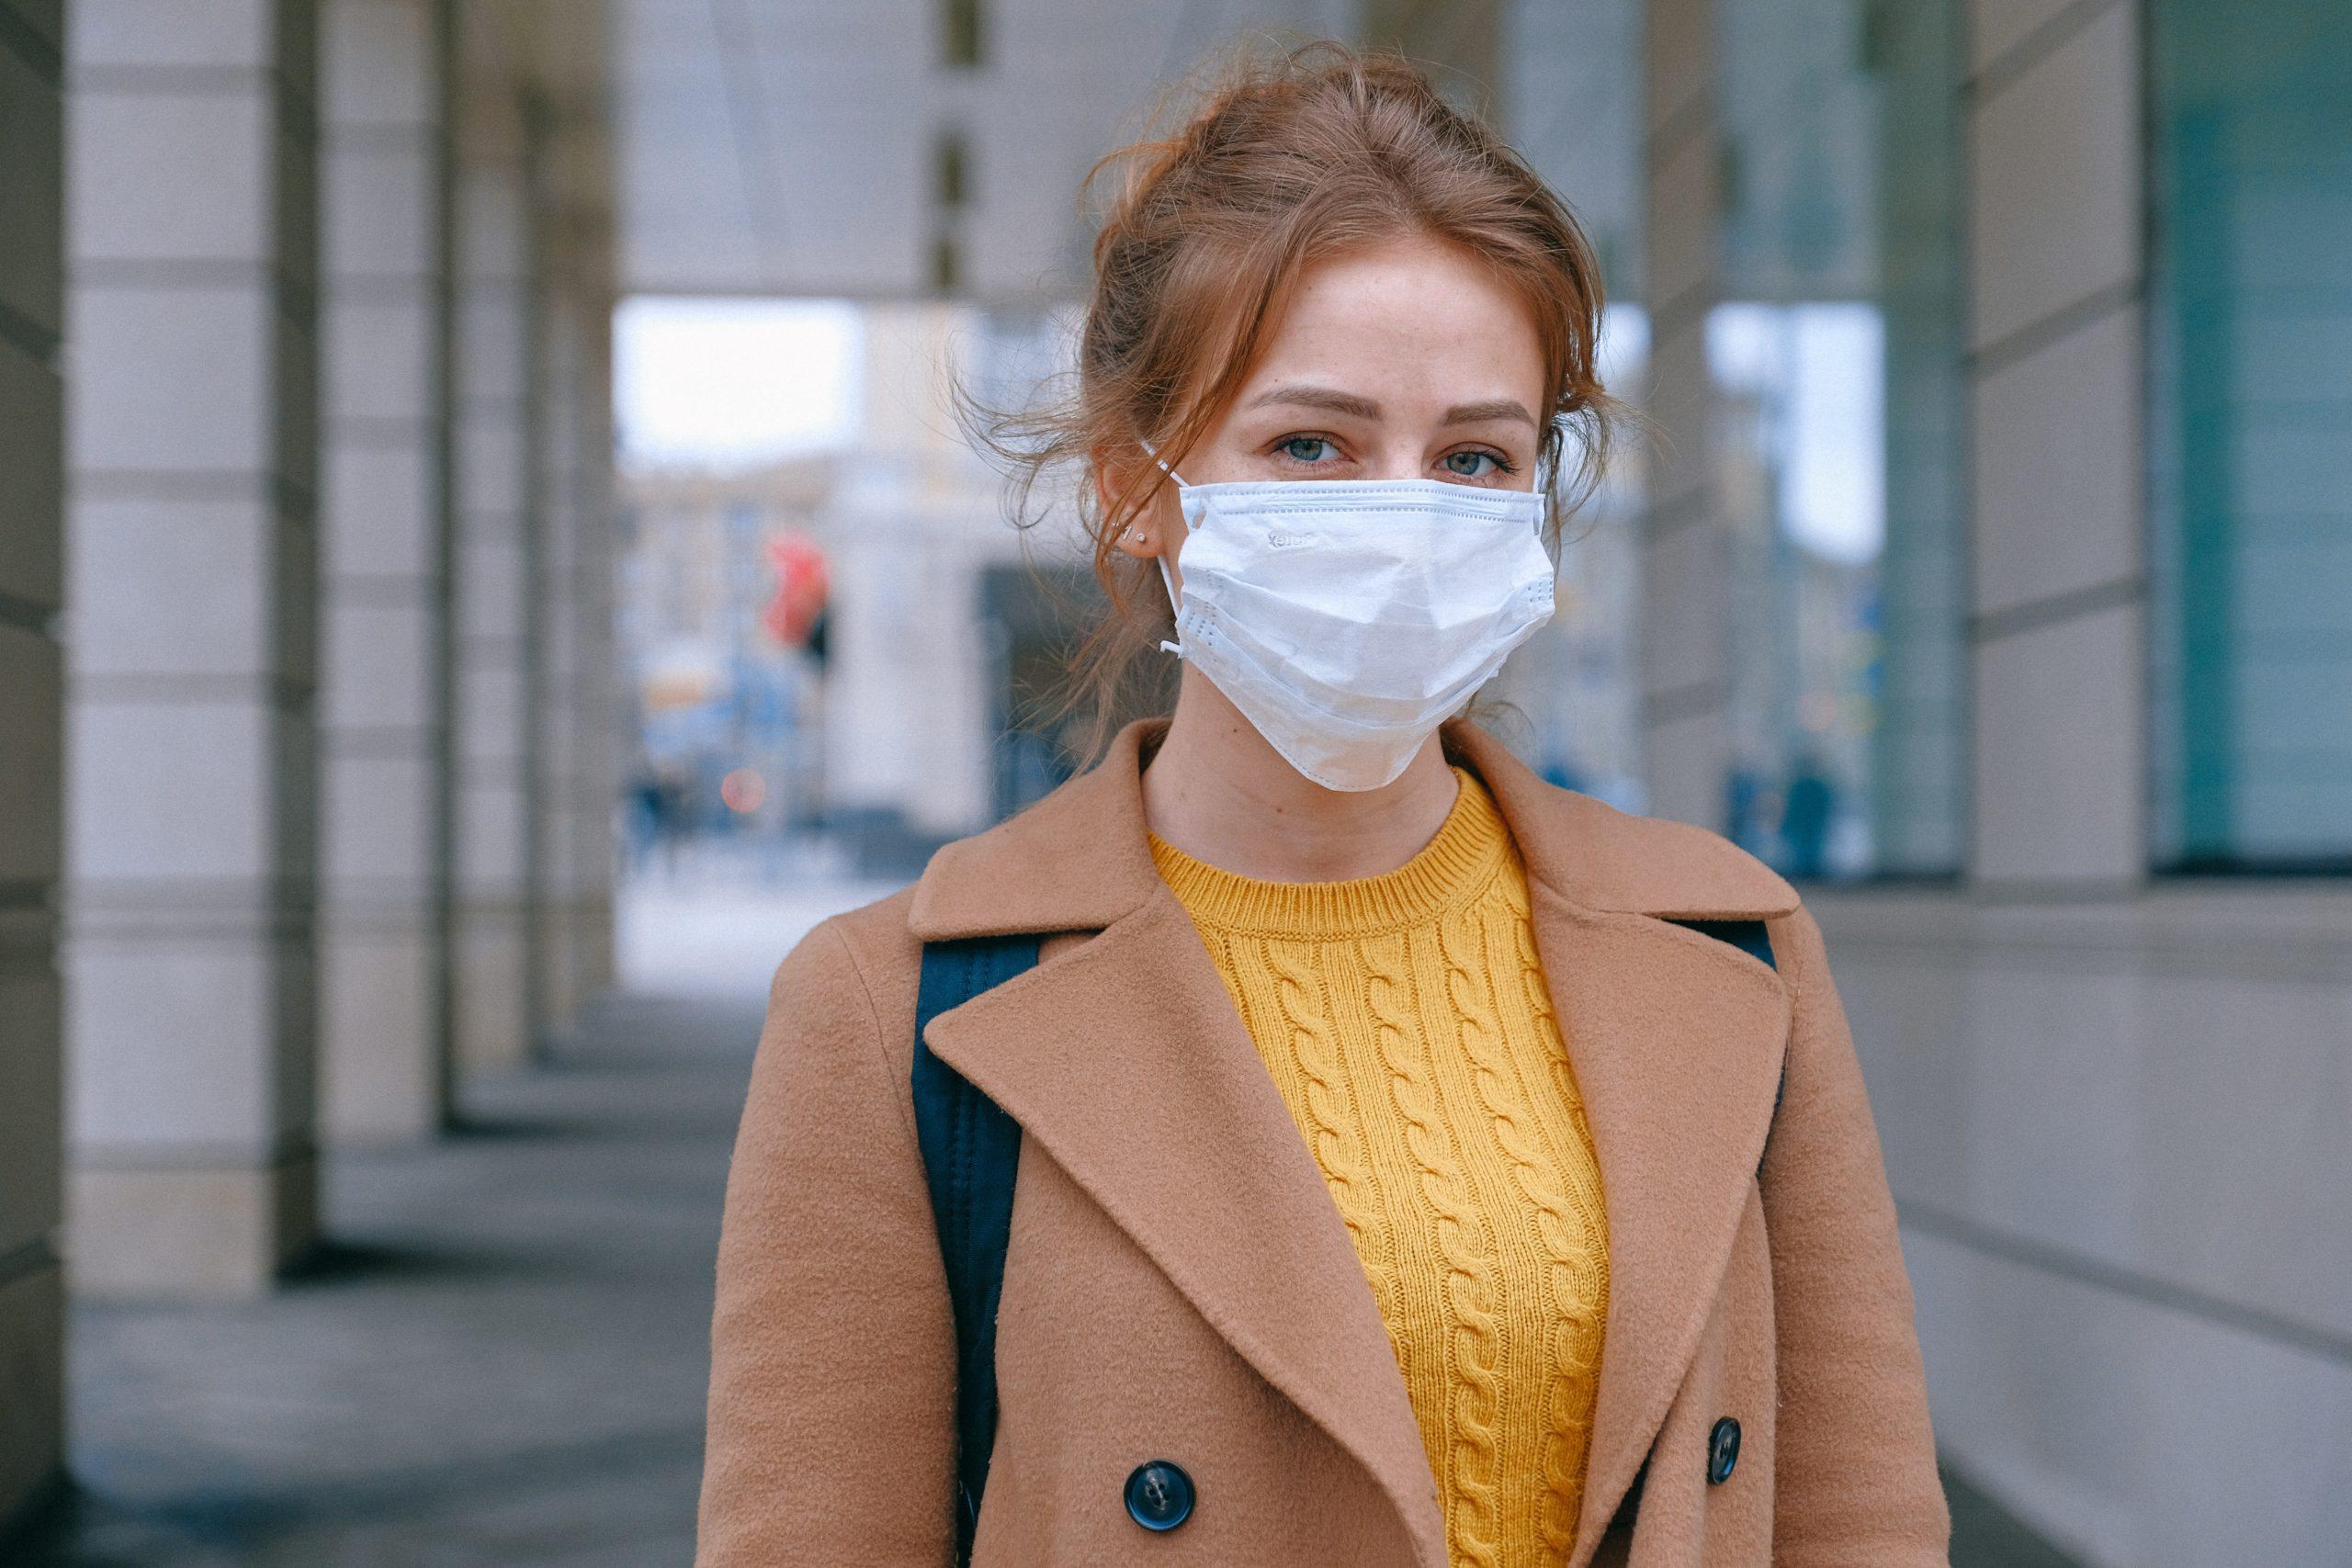 【AOKI】洗えるマスクが通販で予約販売開始公式オンラインショップや店舗はどこ?値段や販売日は?【日本製】